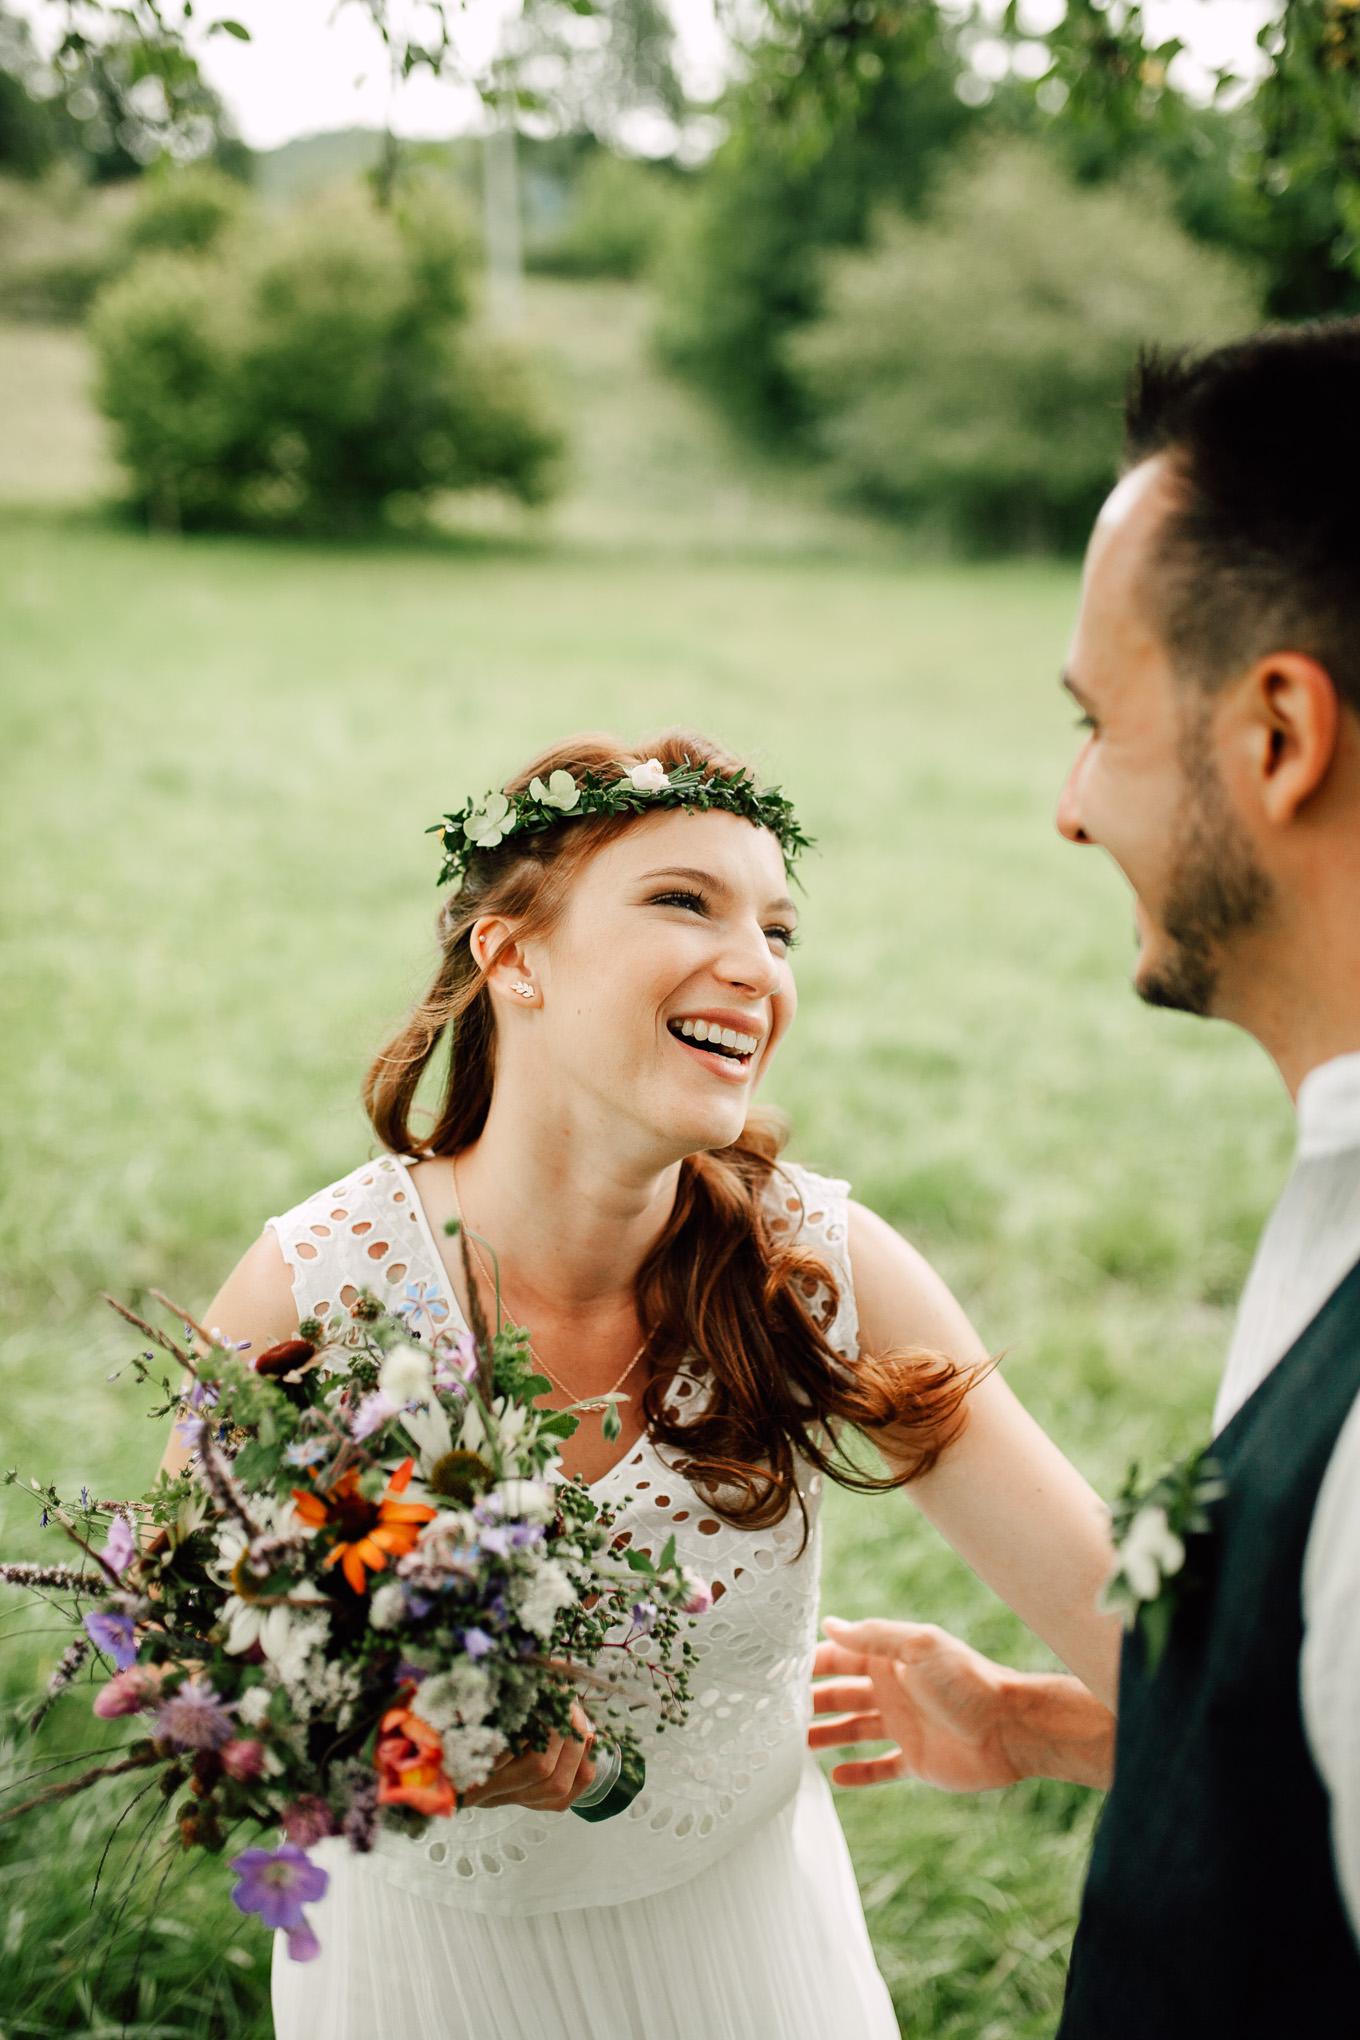 Boho-Scheune-Bauern-Hochzeit-Lörrach-Rheinfelden-Pia-Anna-Christian-Photography-NC-7.jpg